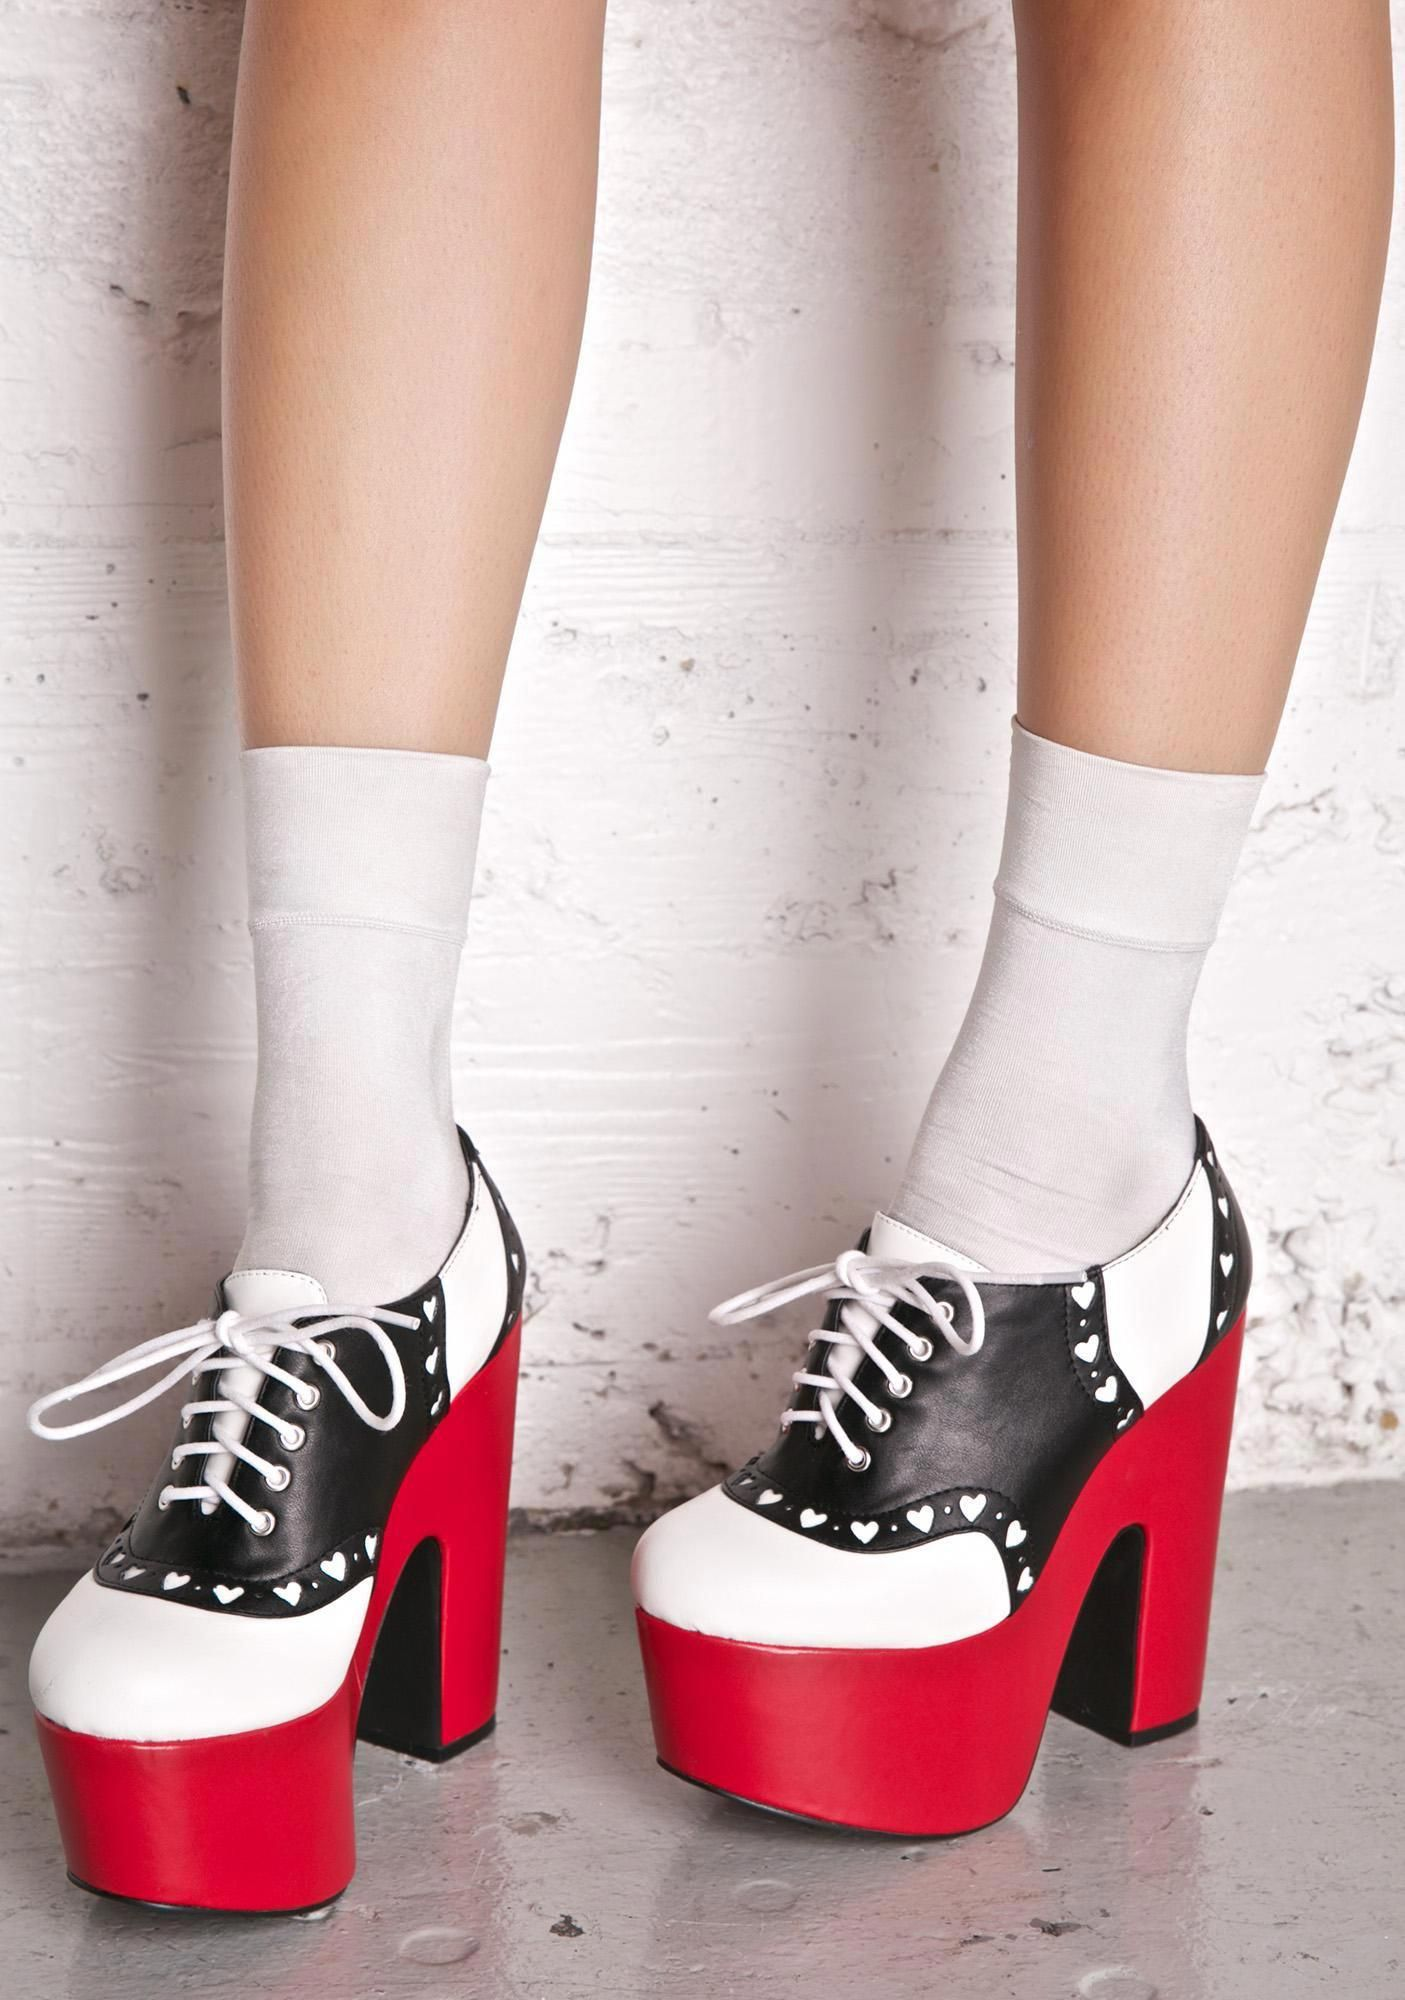 Pole Dance Shoes Clearance